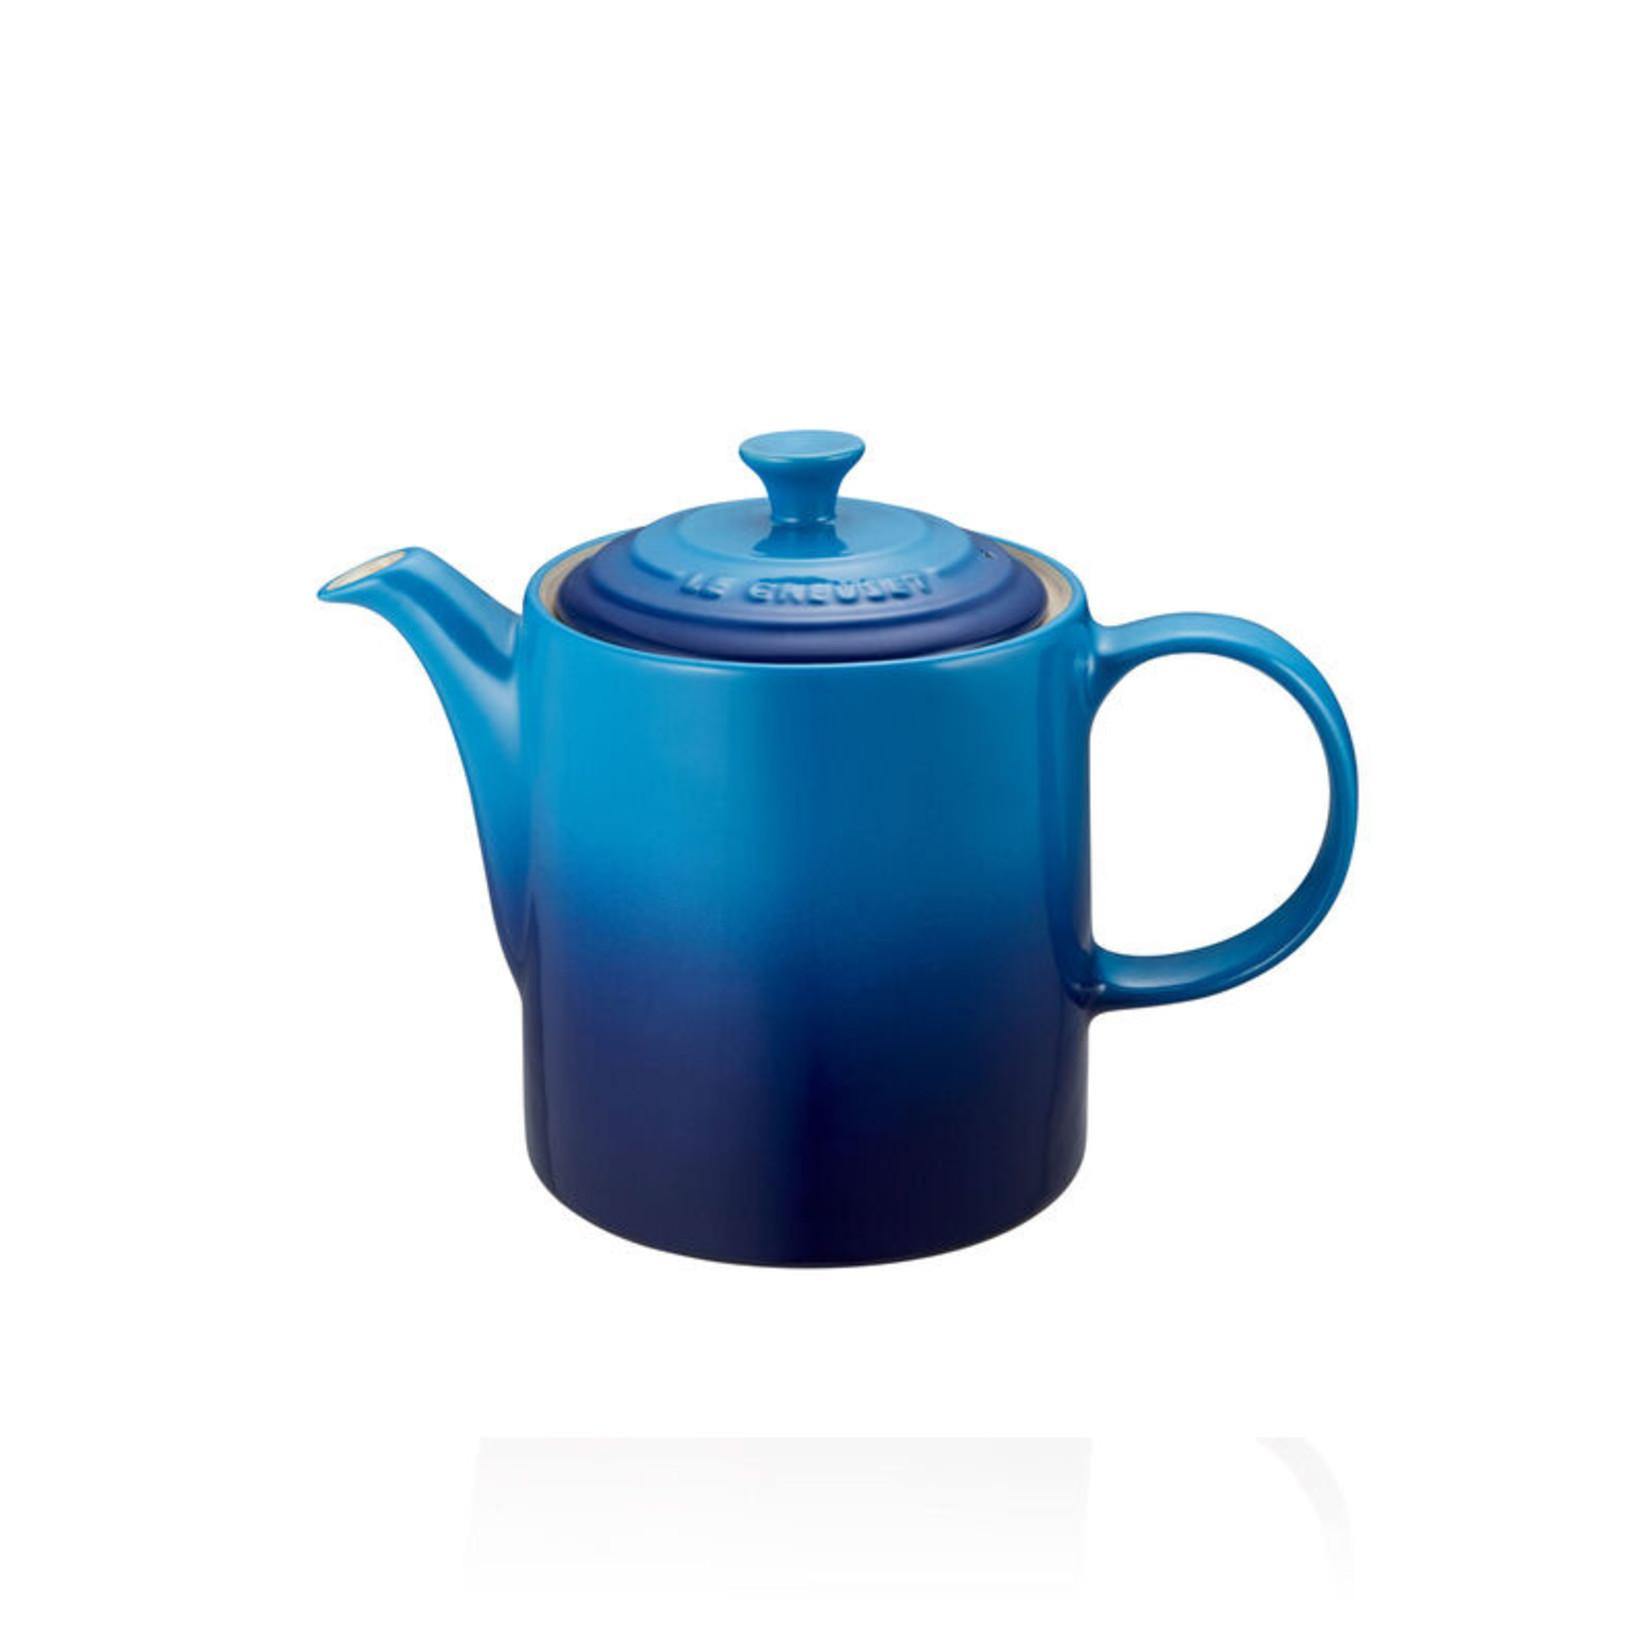 Le Creuset Grand Teapot